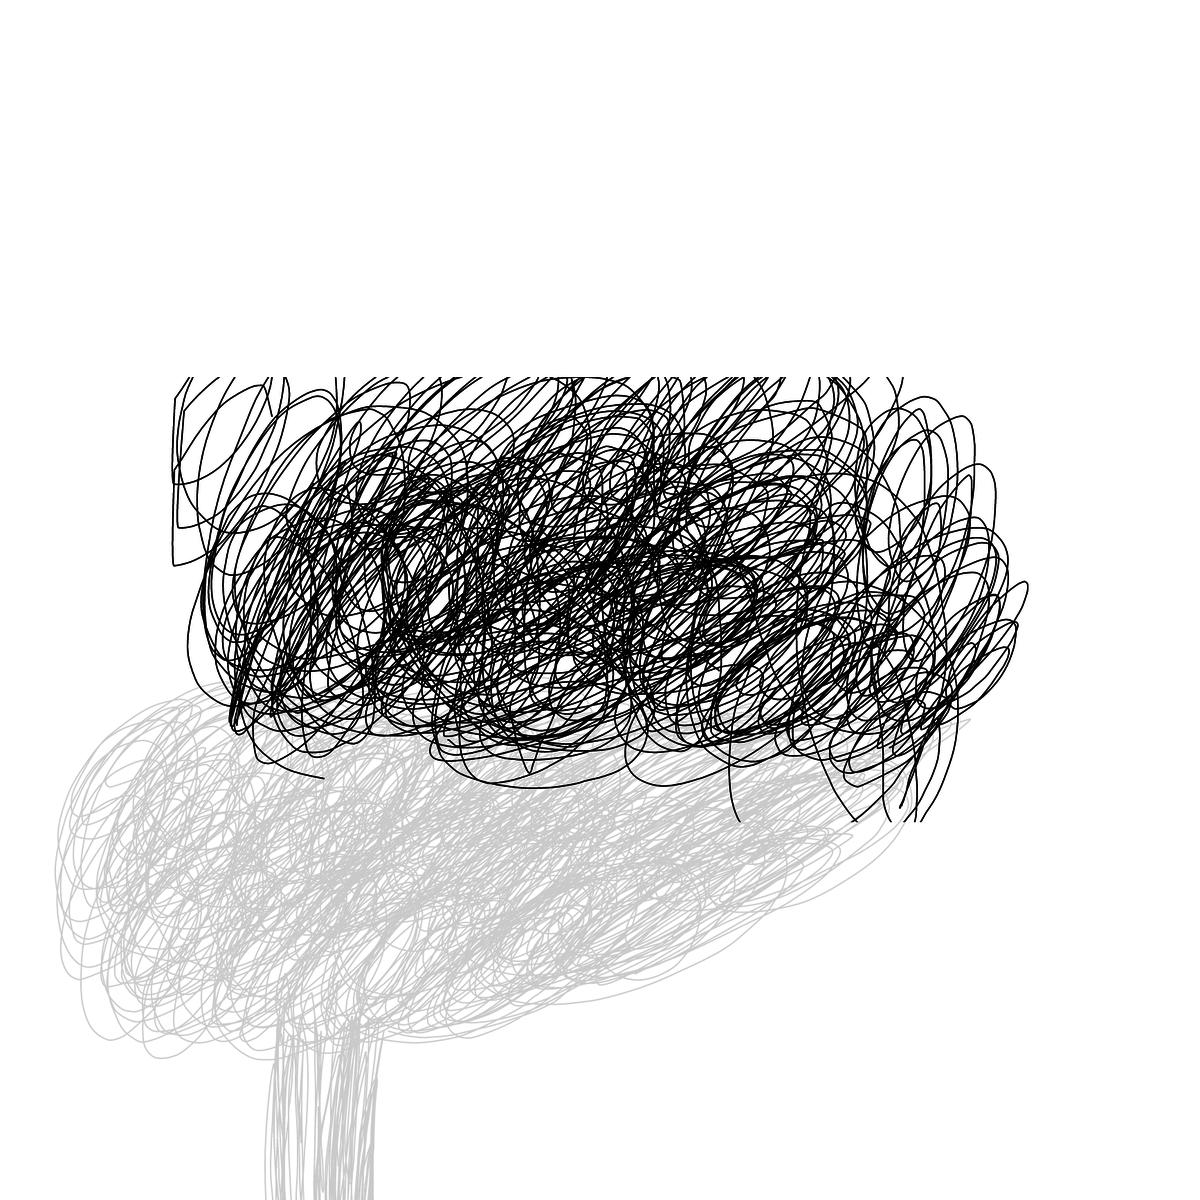 BAAAM drawing#16956 lat:51.2067146301269500lng: 3.2593128681182860